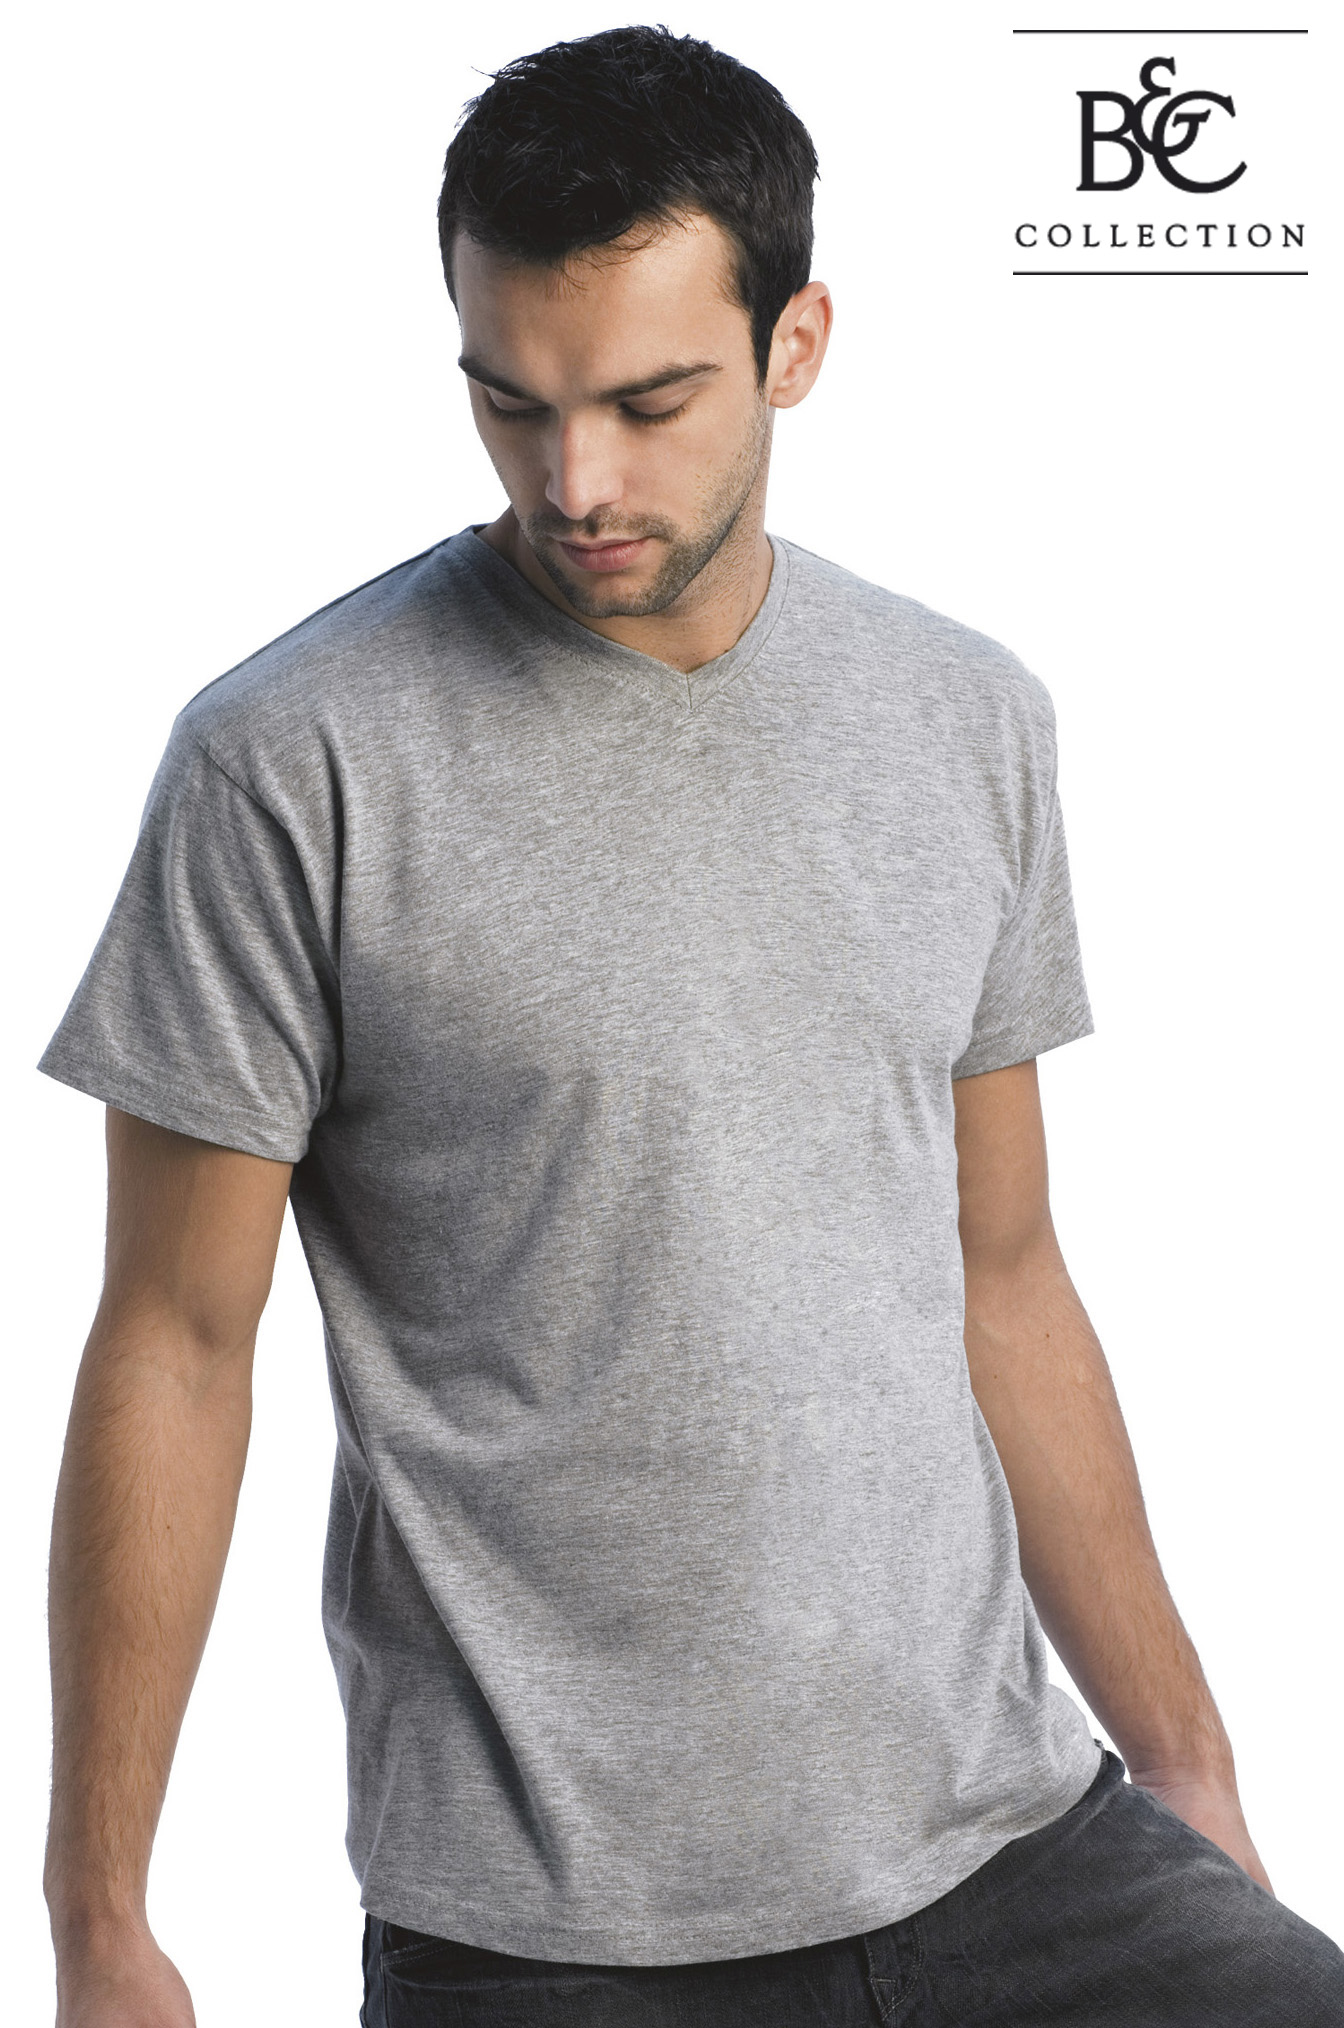 B&C Exact Unisex V-neck T-shirt